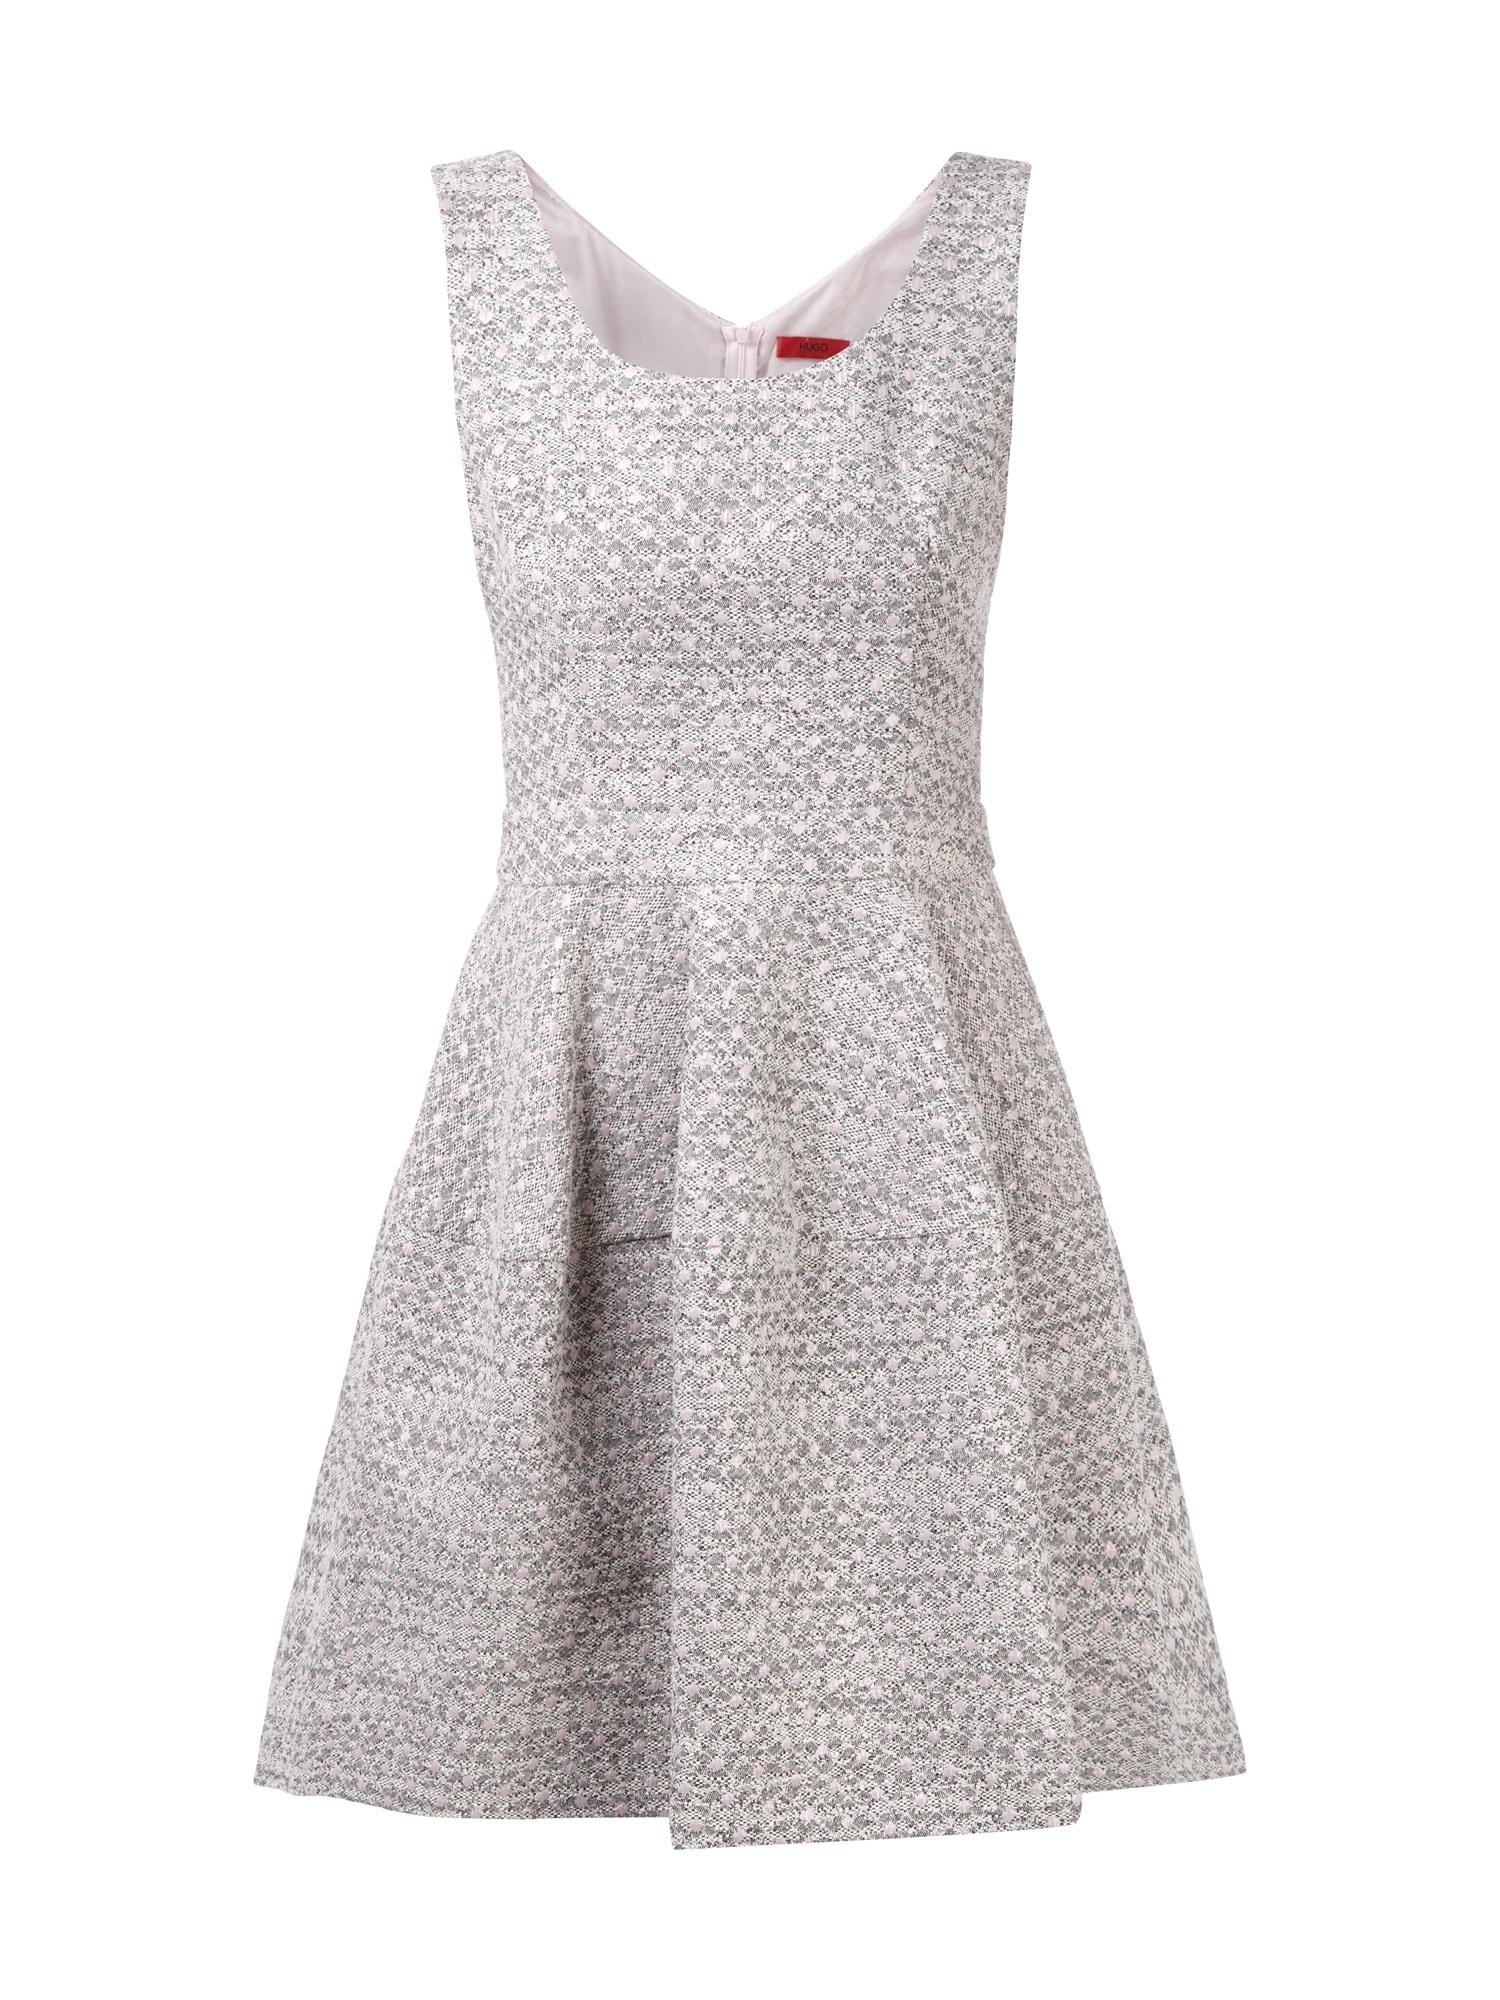 Coolste Kleid Rosa Grau StylishFormal Ausgezeichnet Kleid Rosa Grau Boutique